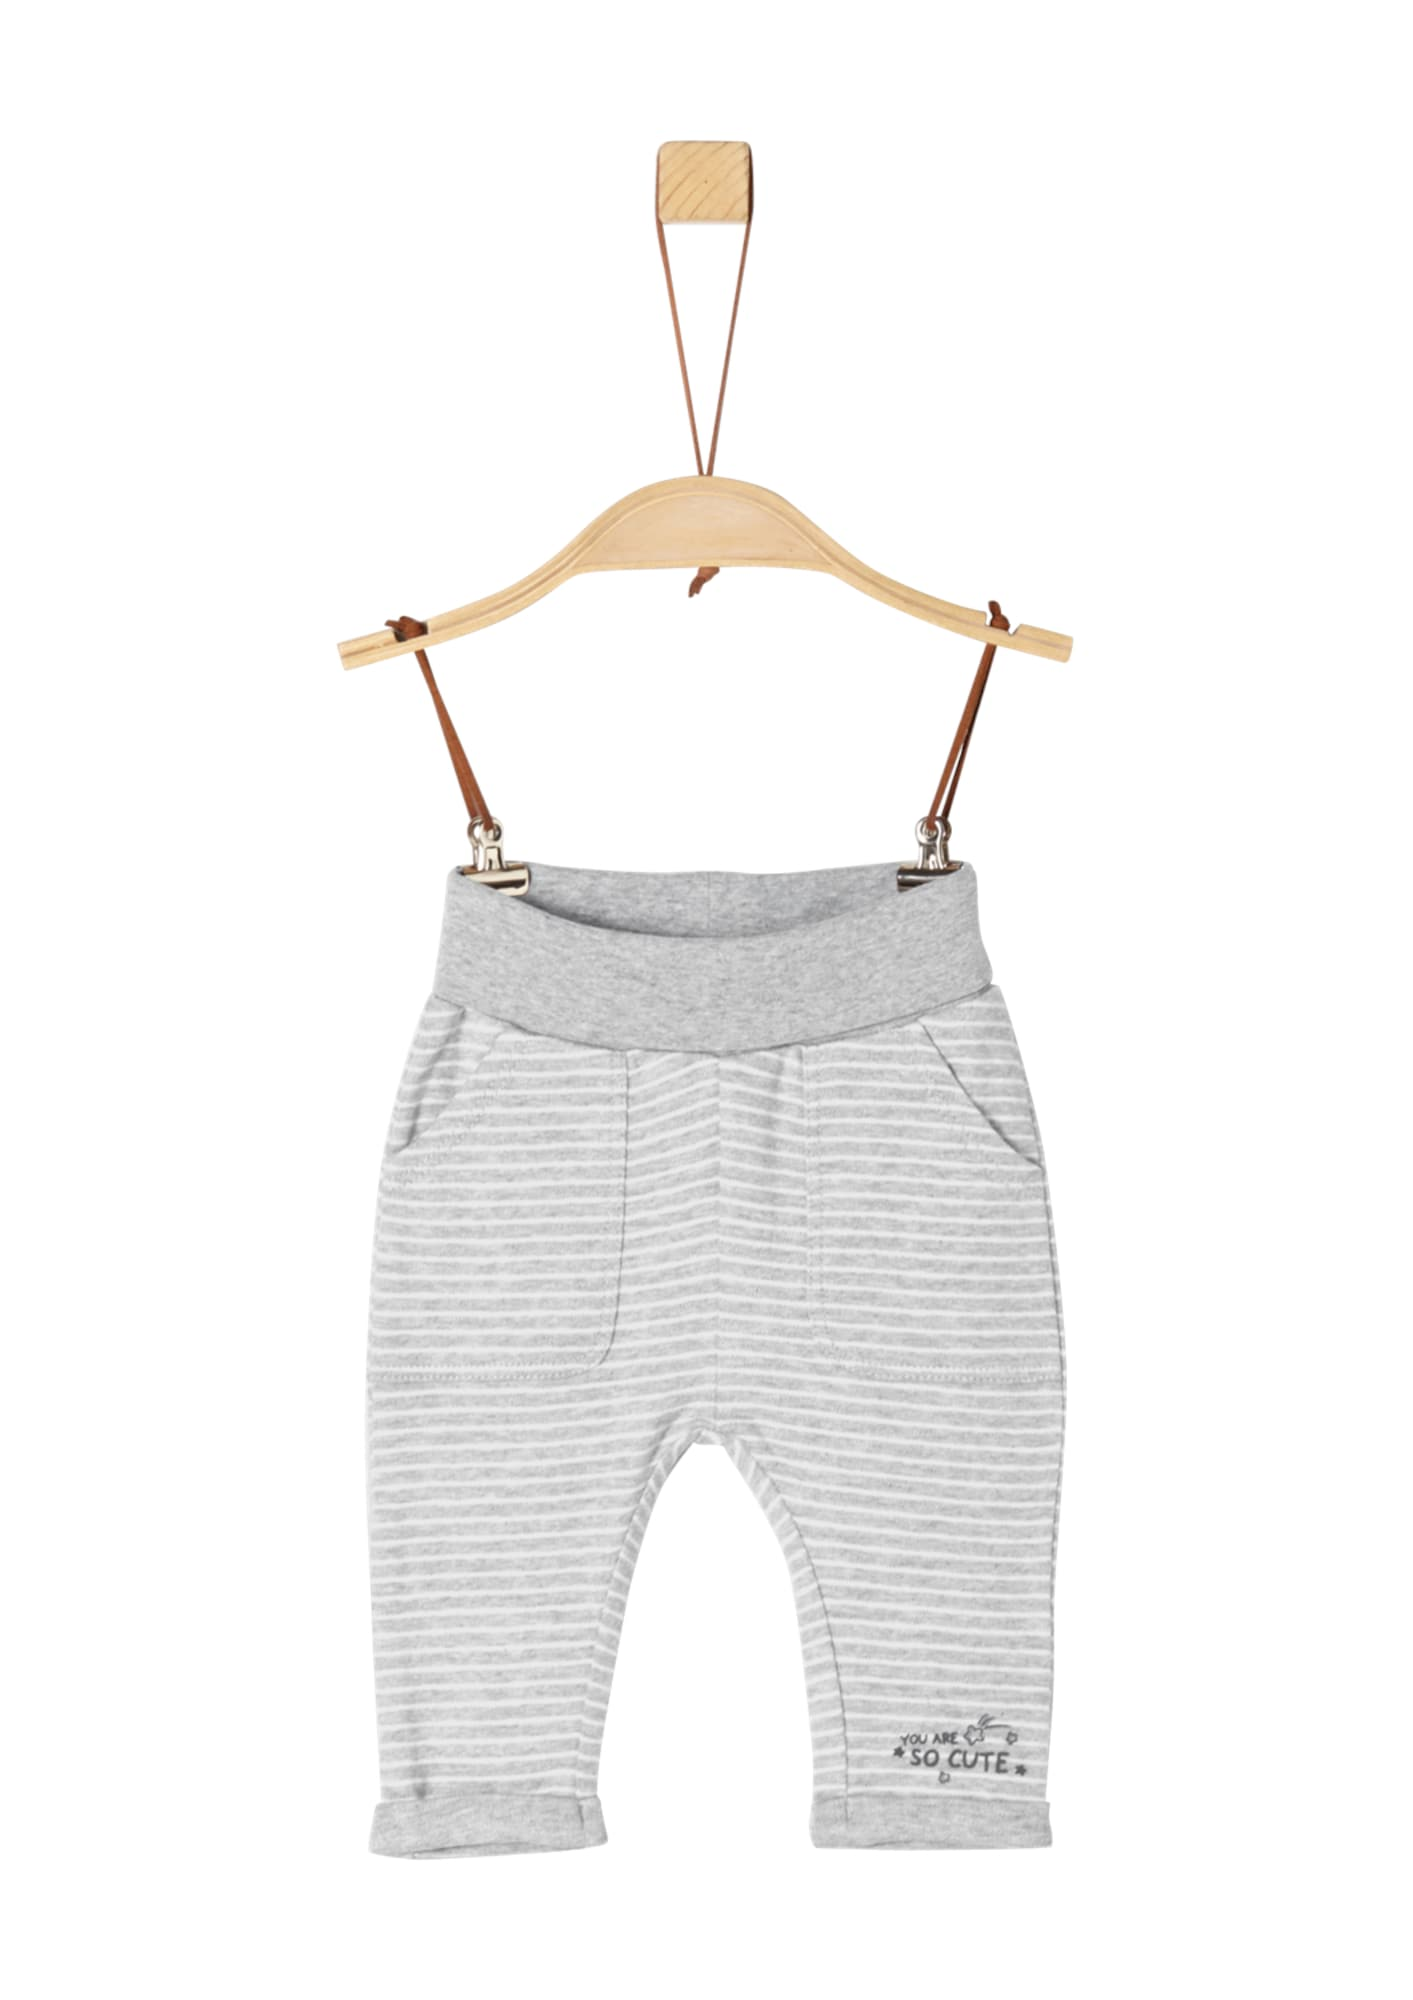 Jerseypants